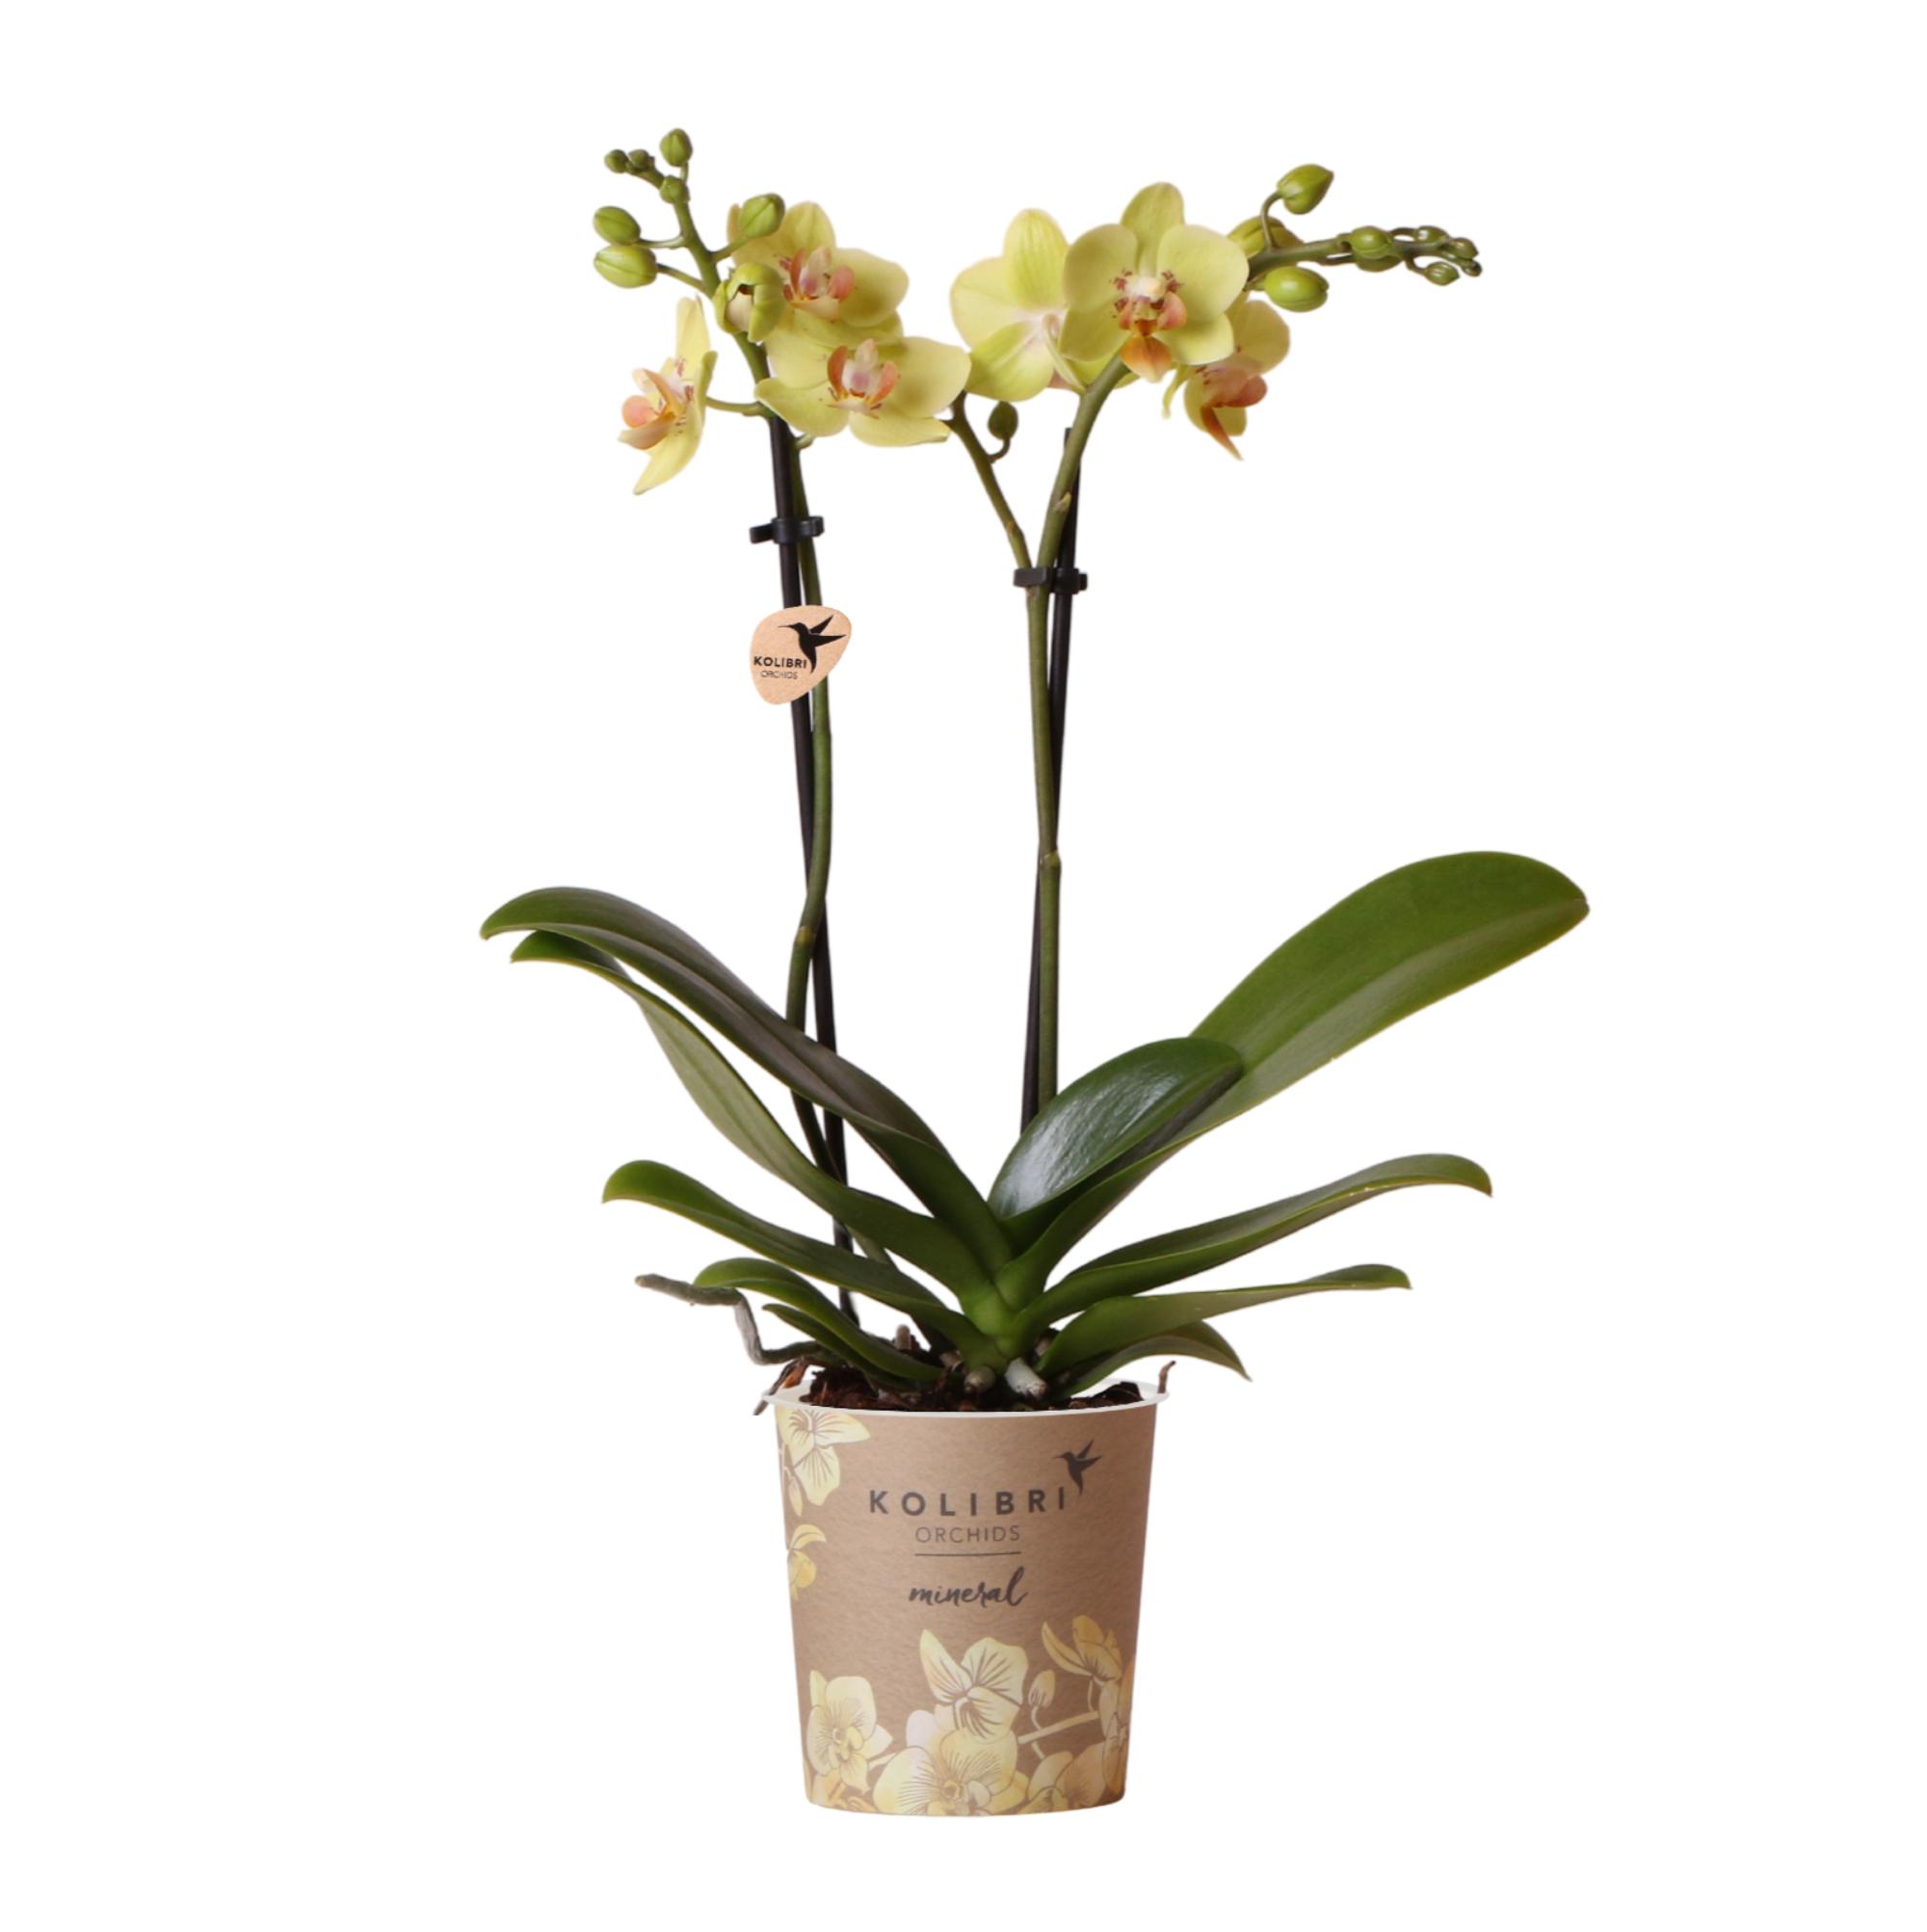 Kolibri Company - Kolibri Orchids Phalaenopsis orchidee Malta geel 9cm